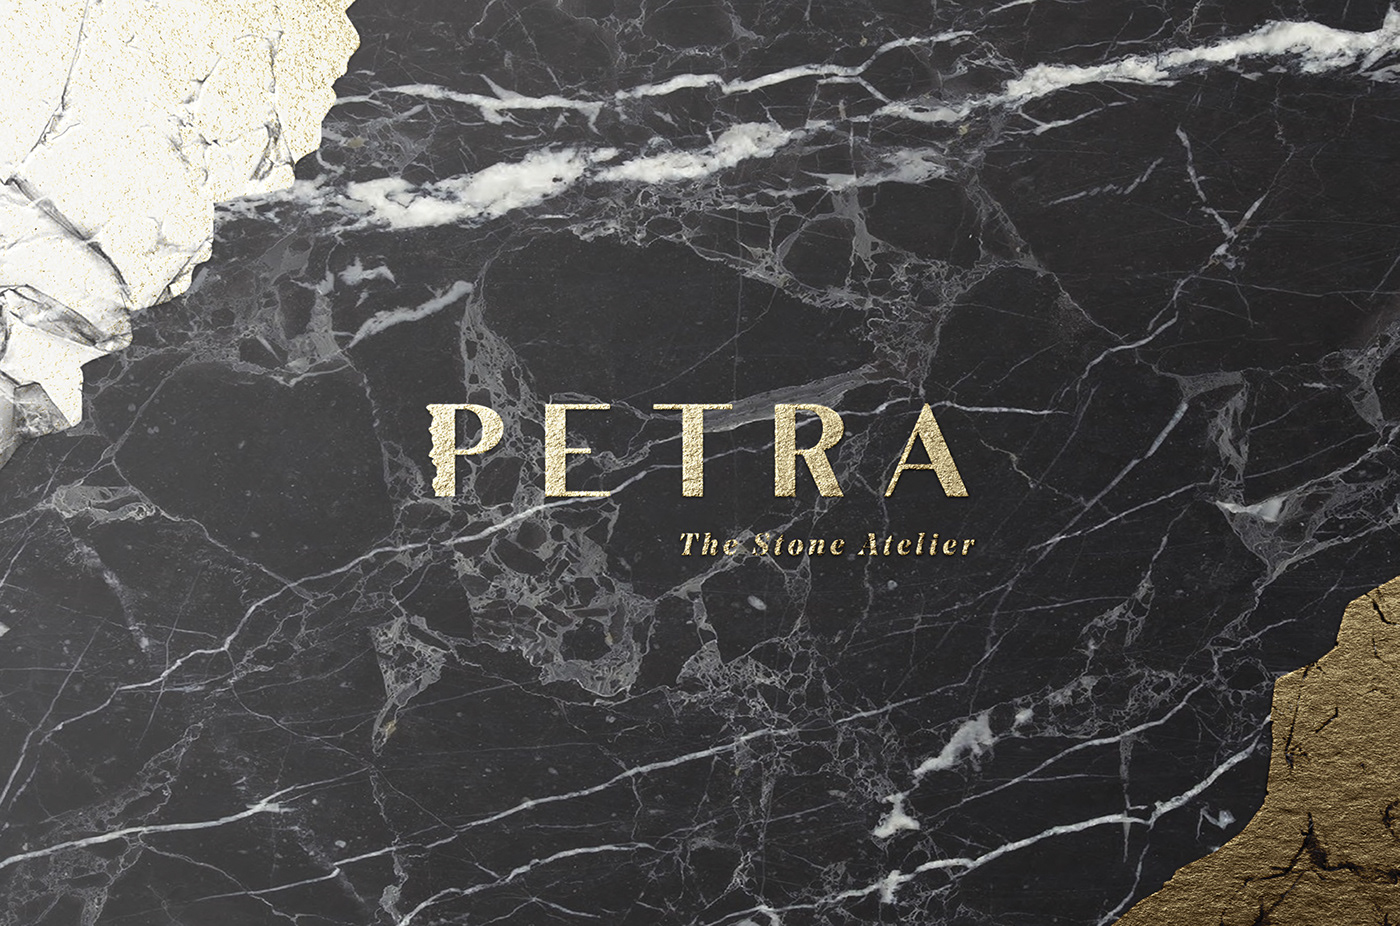 piedra stone atelier muebles furniture marmol Marble lujo luxury valencia gold golden oro